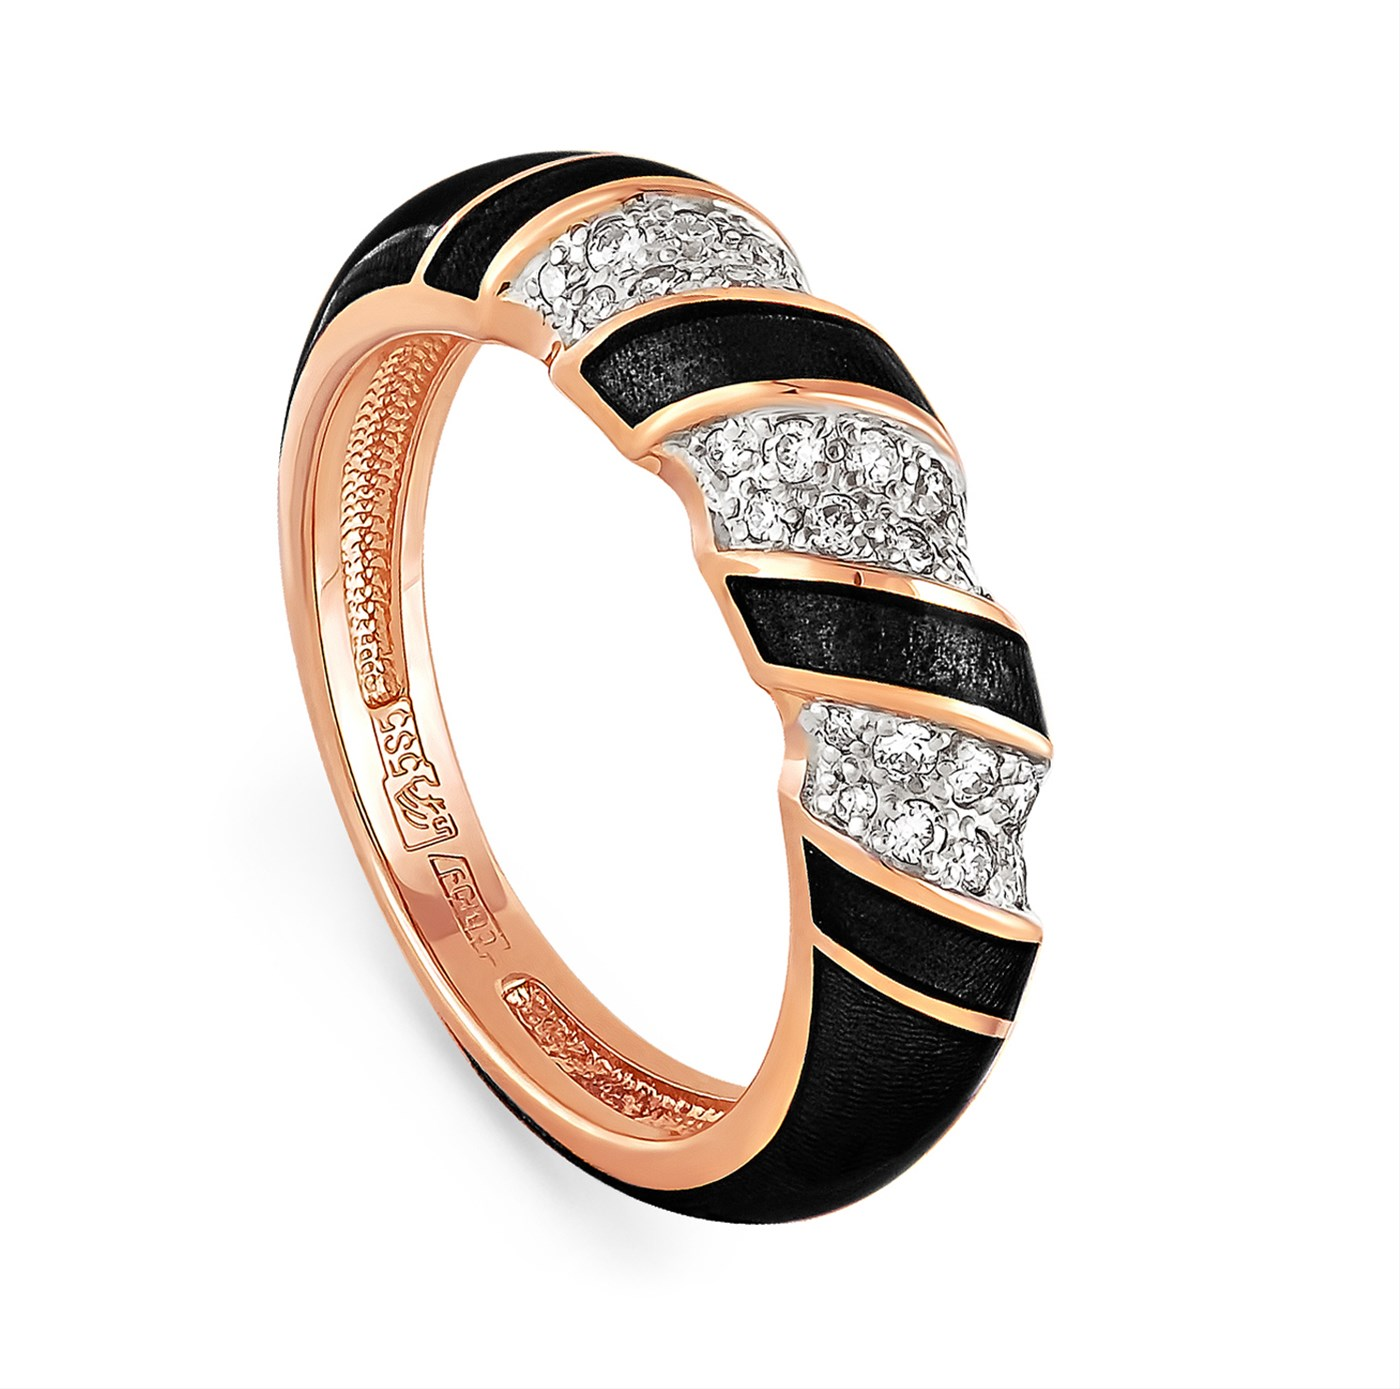 Золотое кольцо Бриллиант арт. 11-0590-1002 11-0590-1002